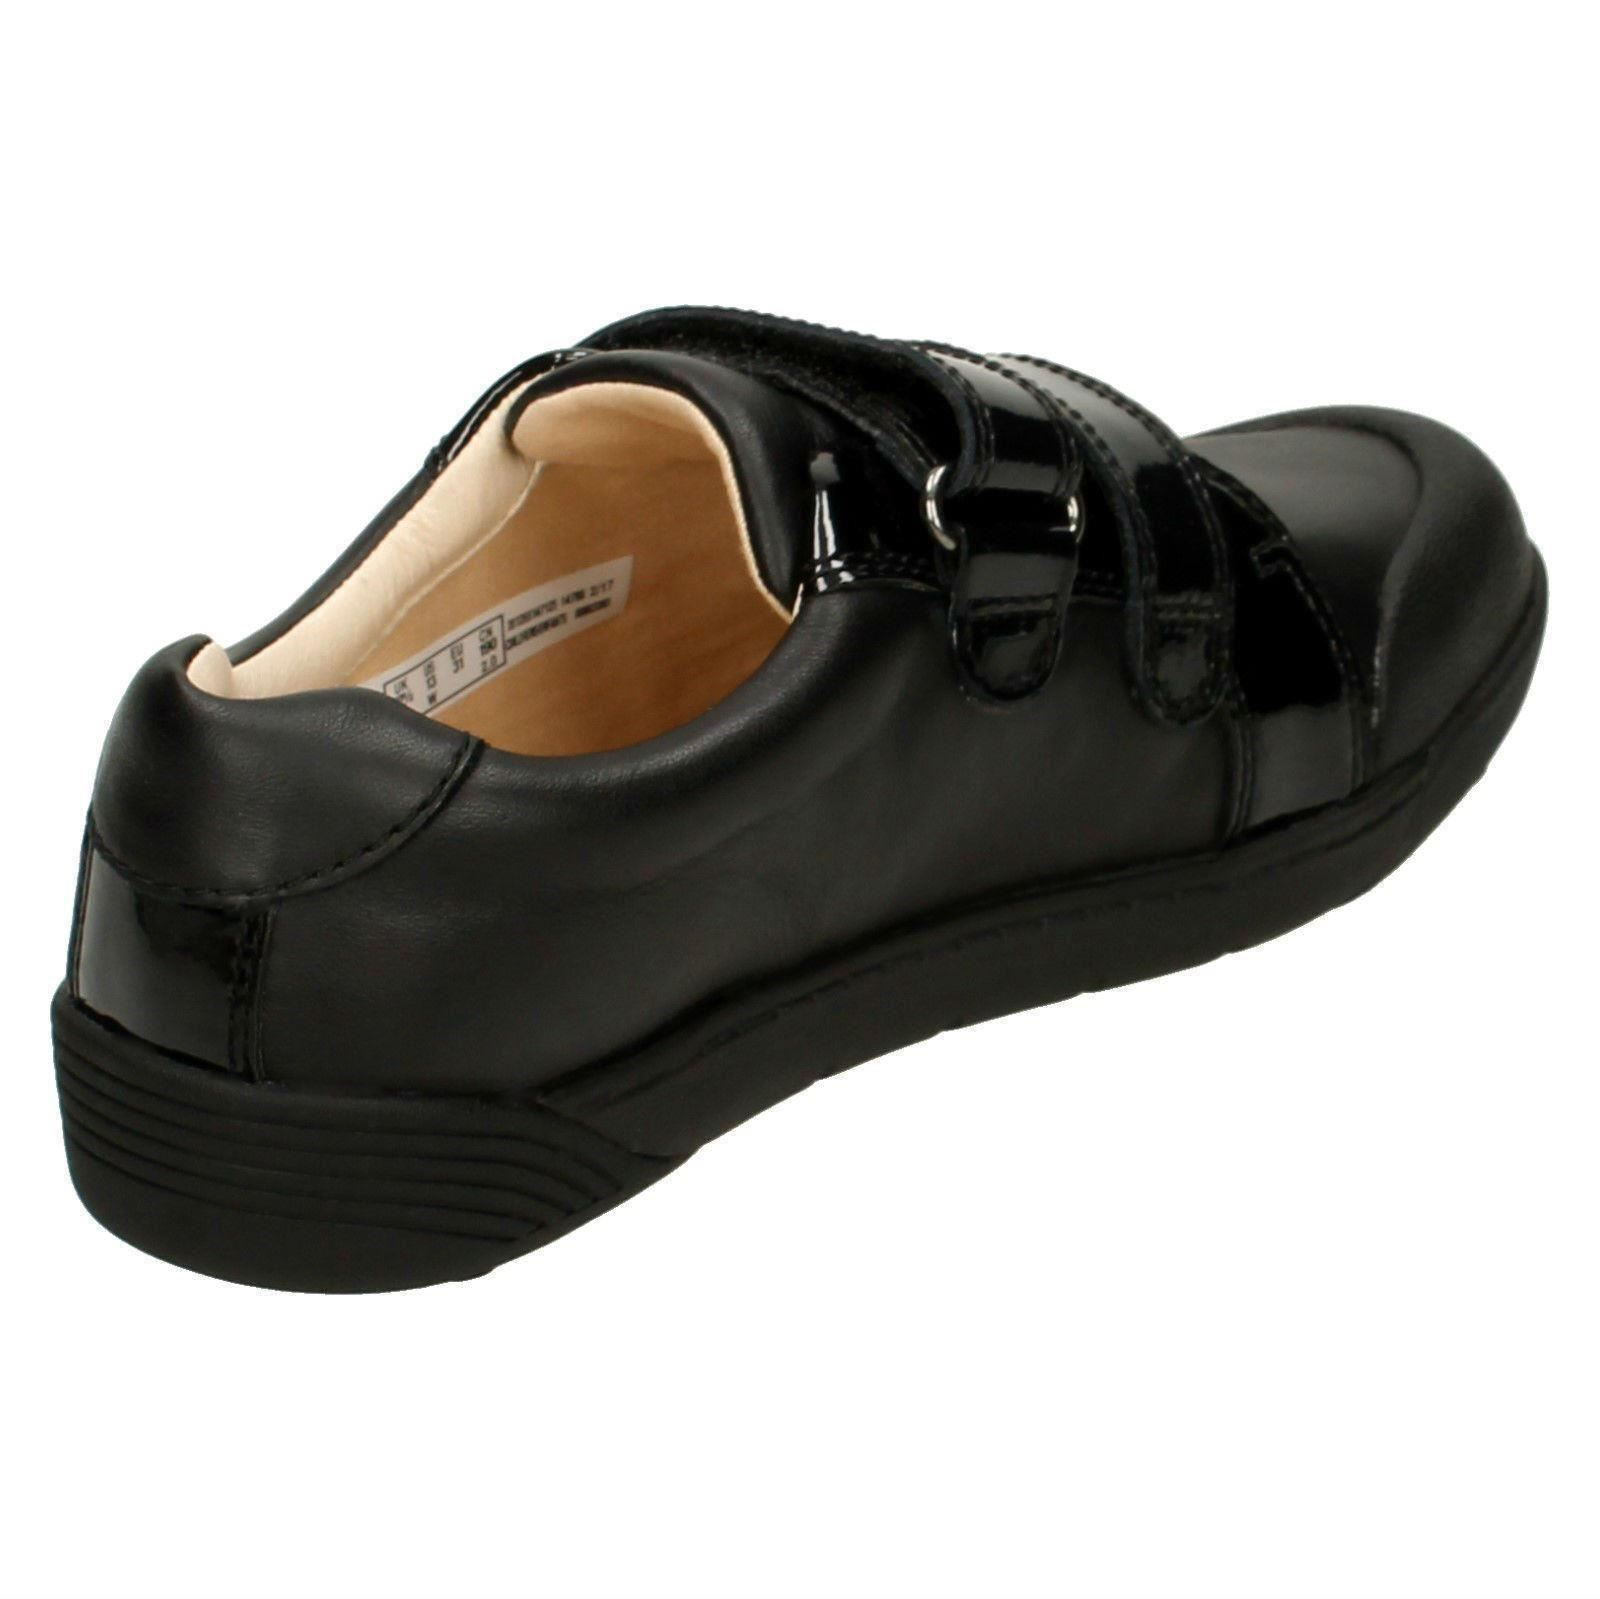 Chicas Clarks Zapatos Escolares inteligente Lil Folk Bel